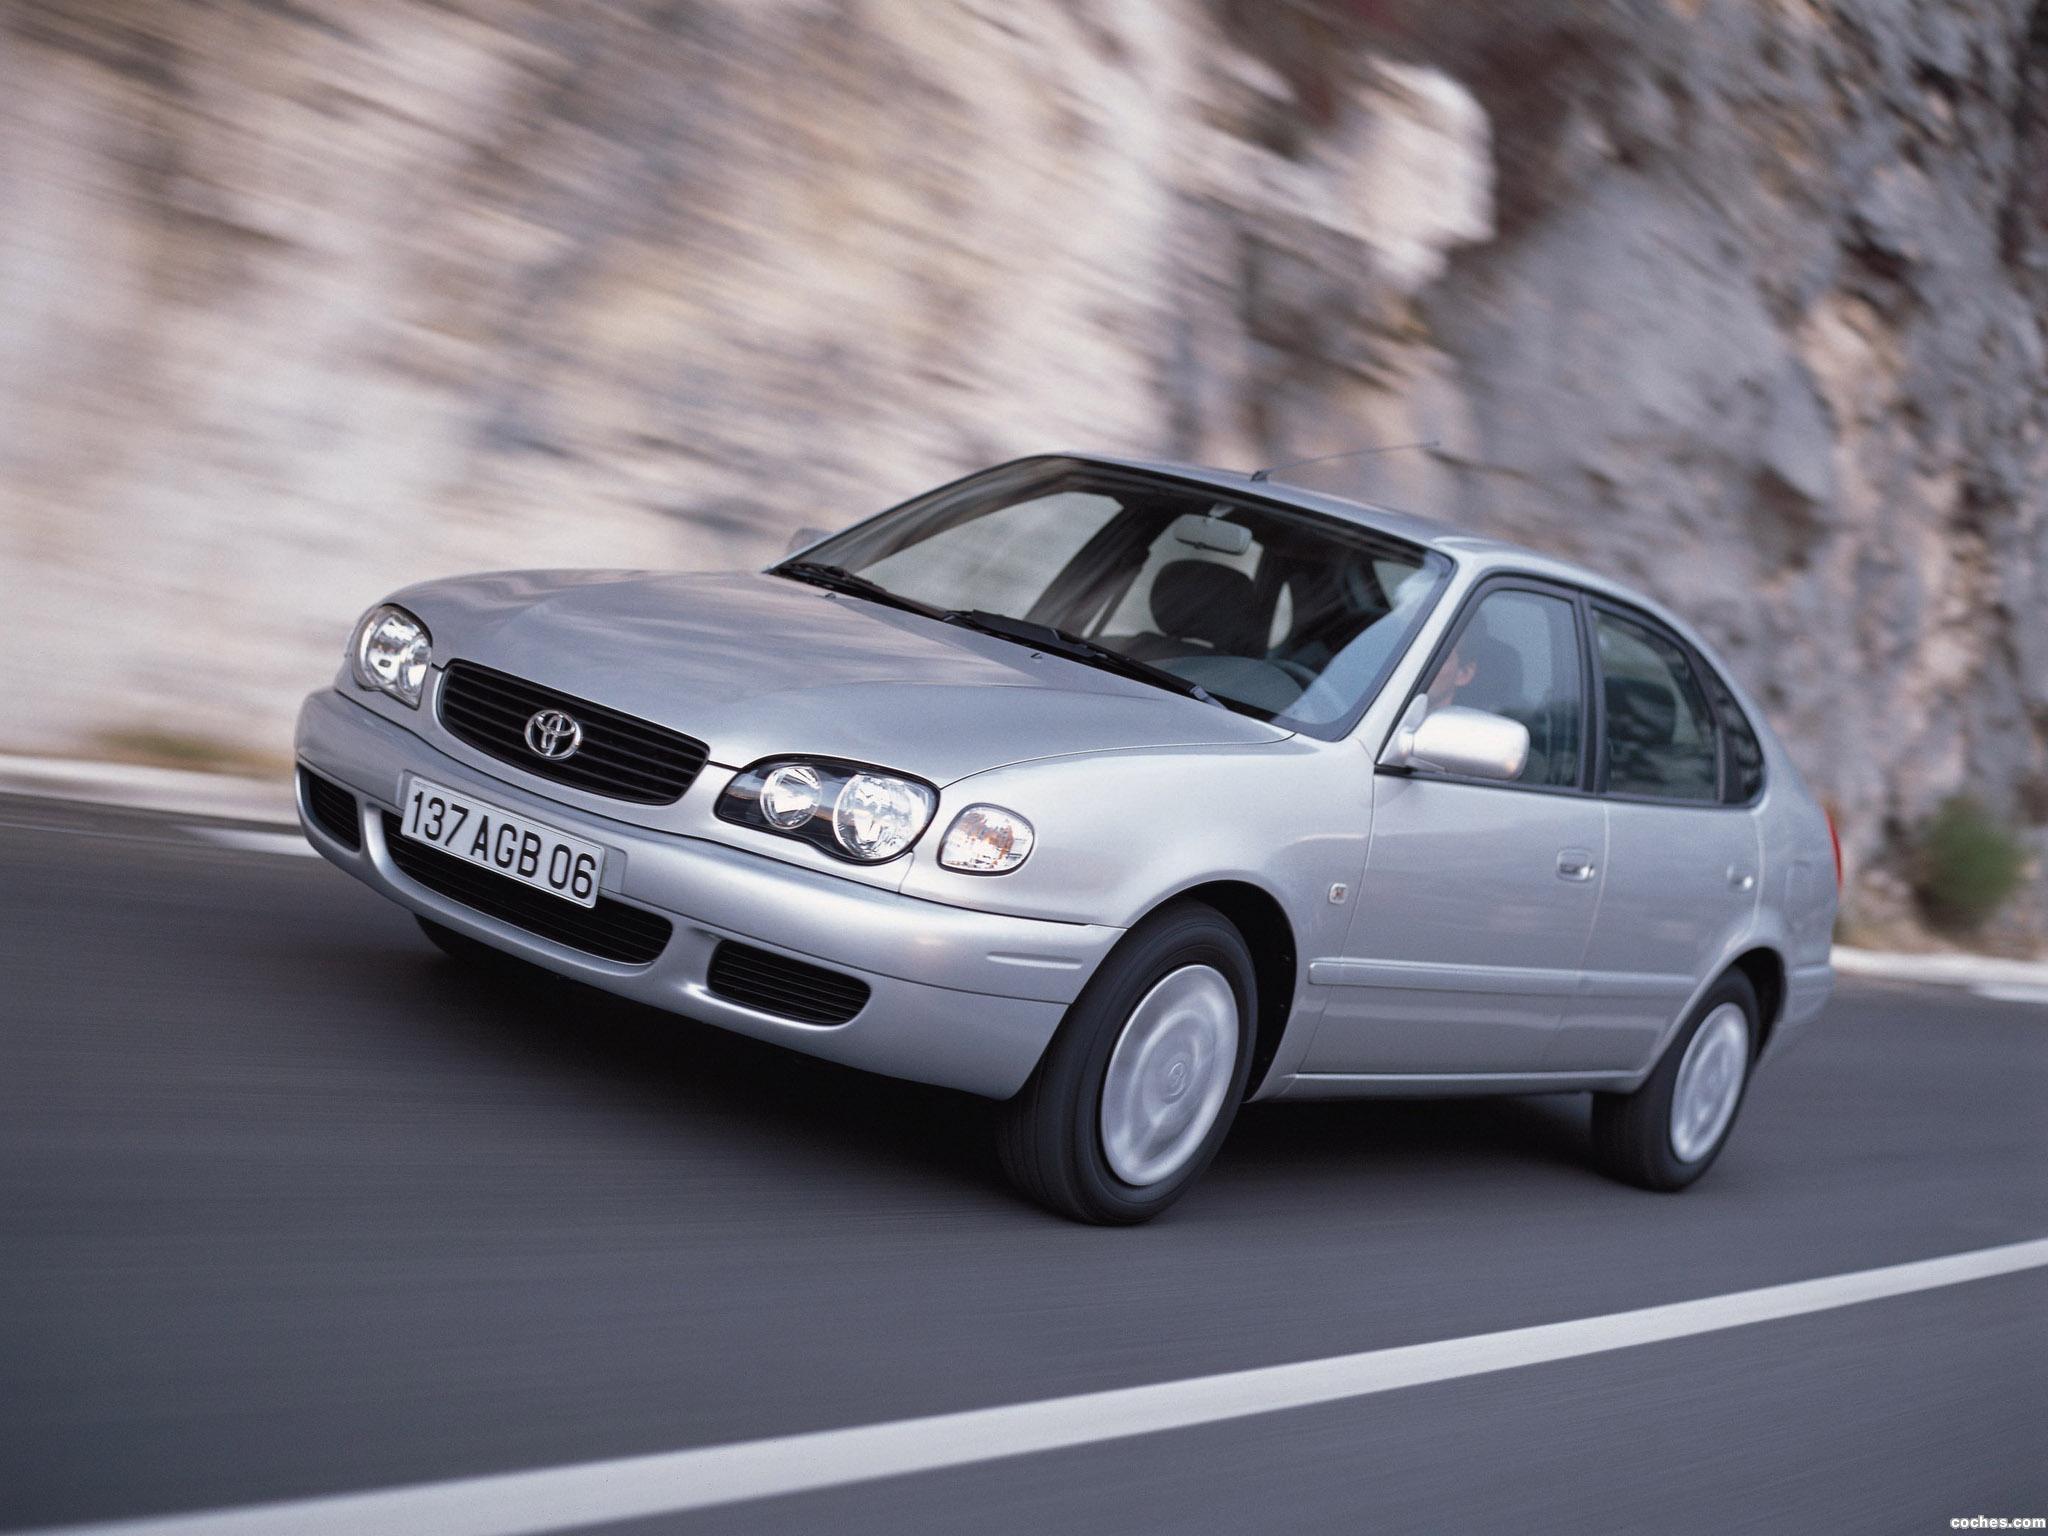 Foto 2 de Toyota Corolla 5 puertas 1999